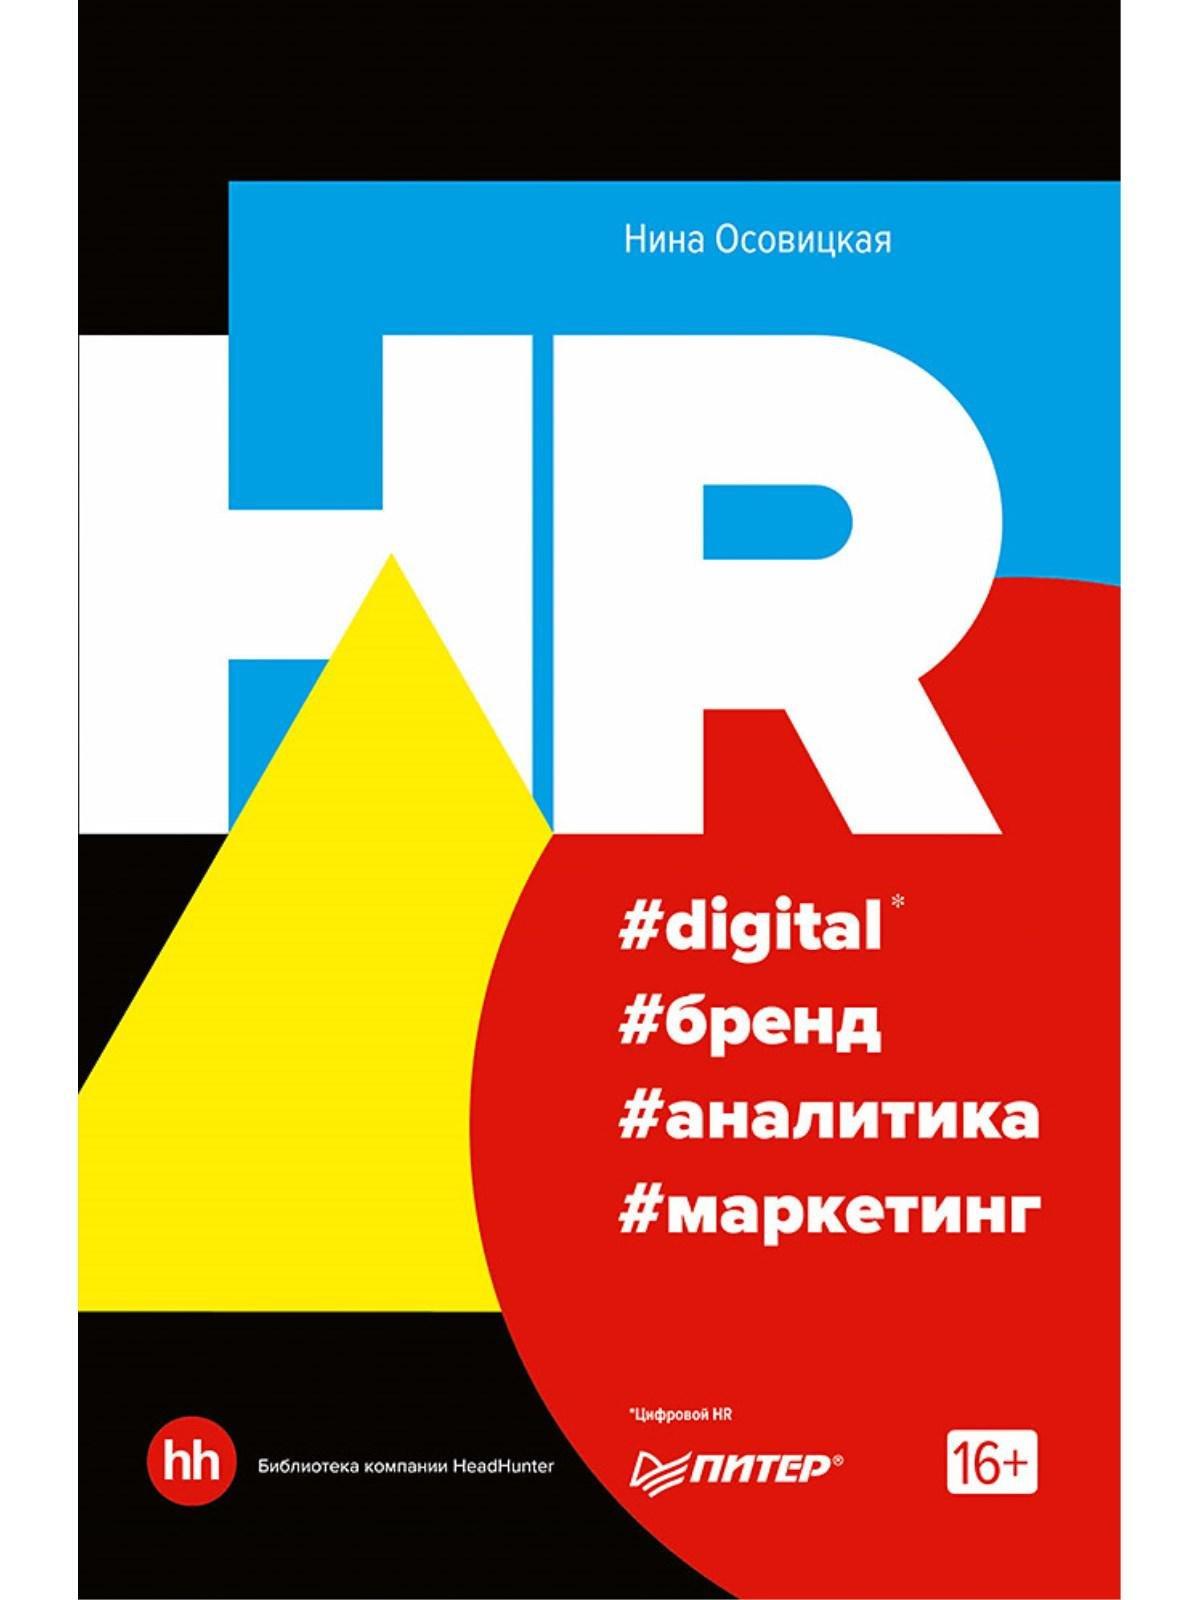 HR #digital #бренд #аналитика #маркетинг ( Осовицкая Н. А.  )